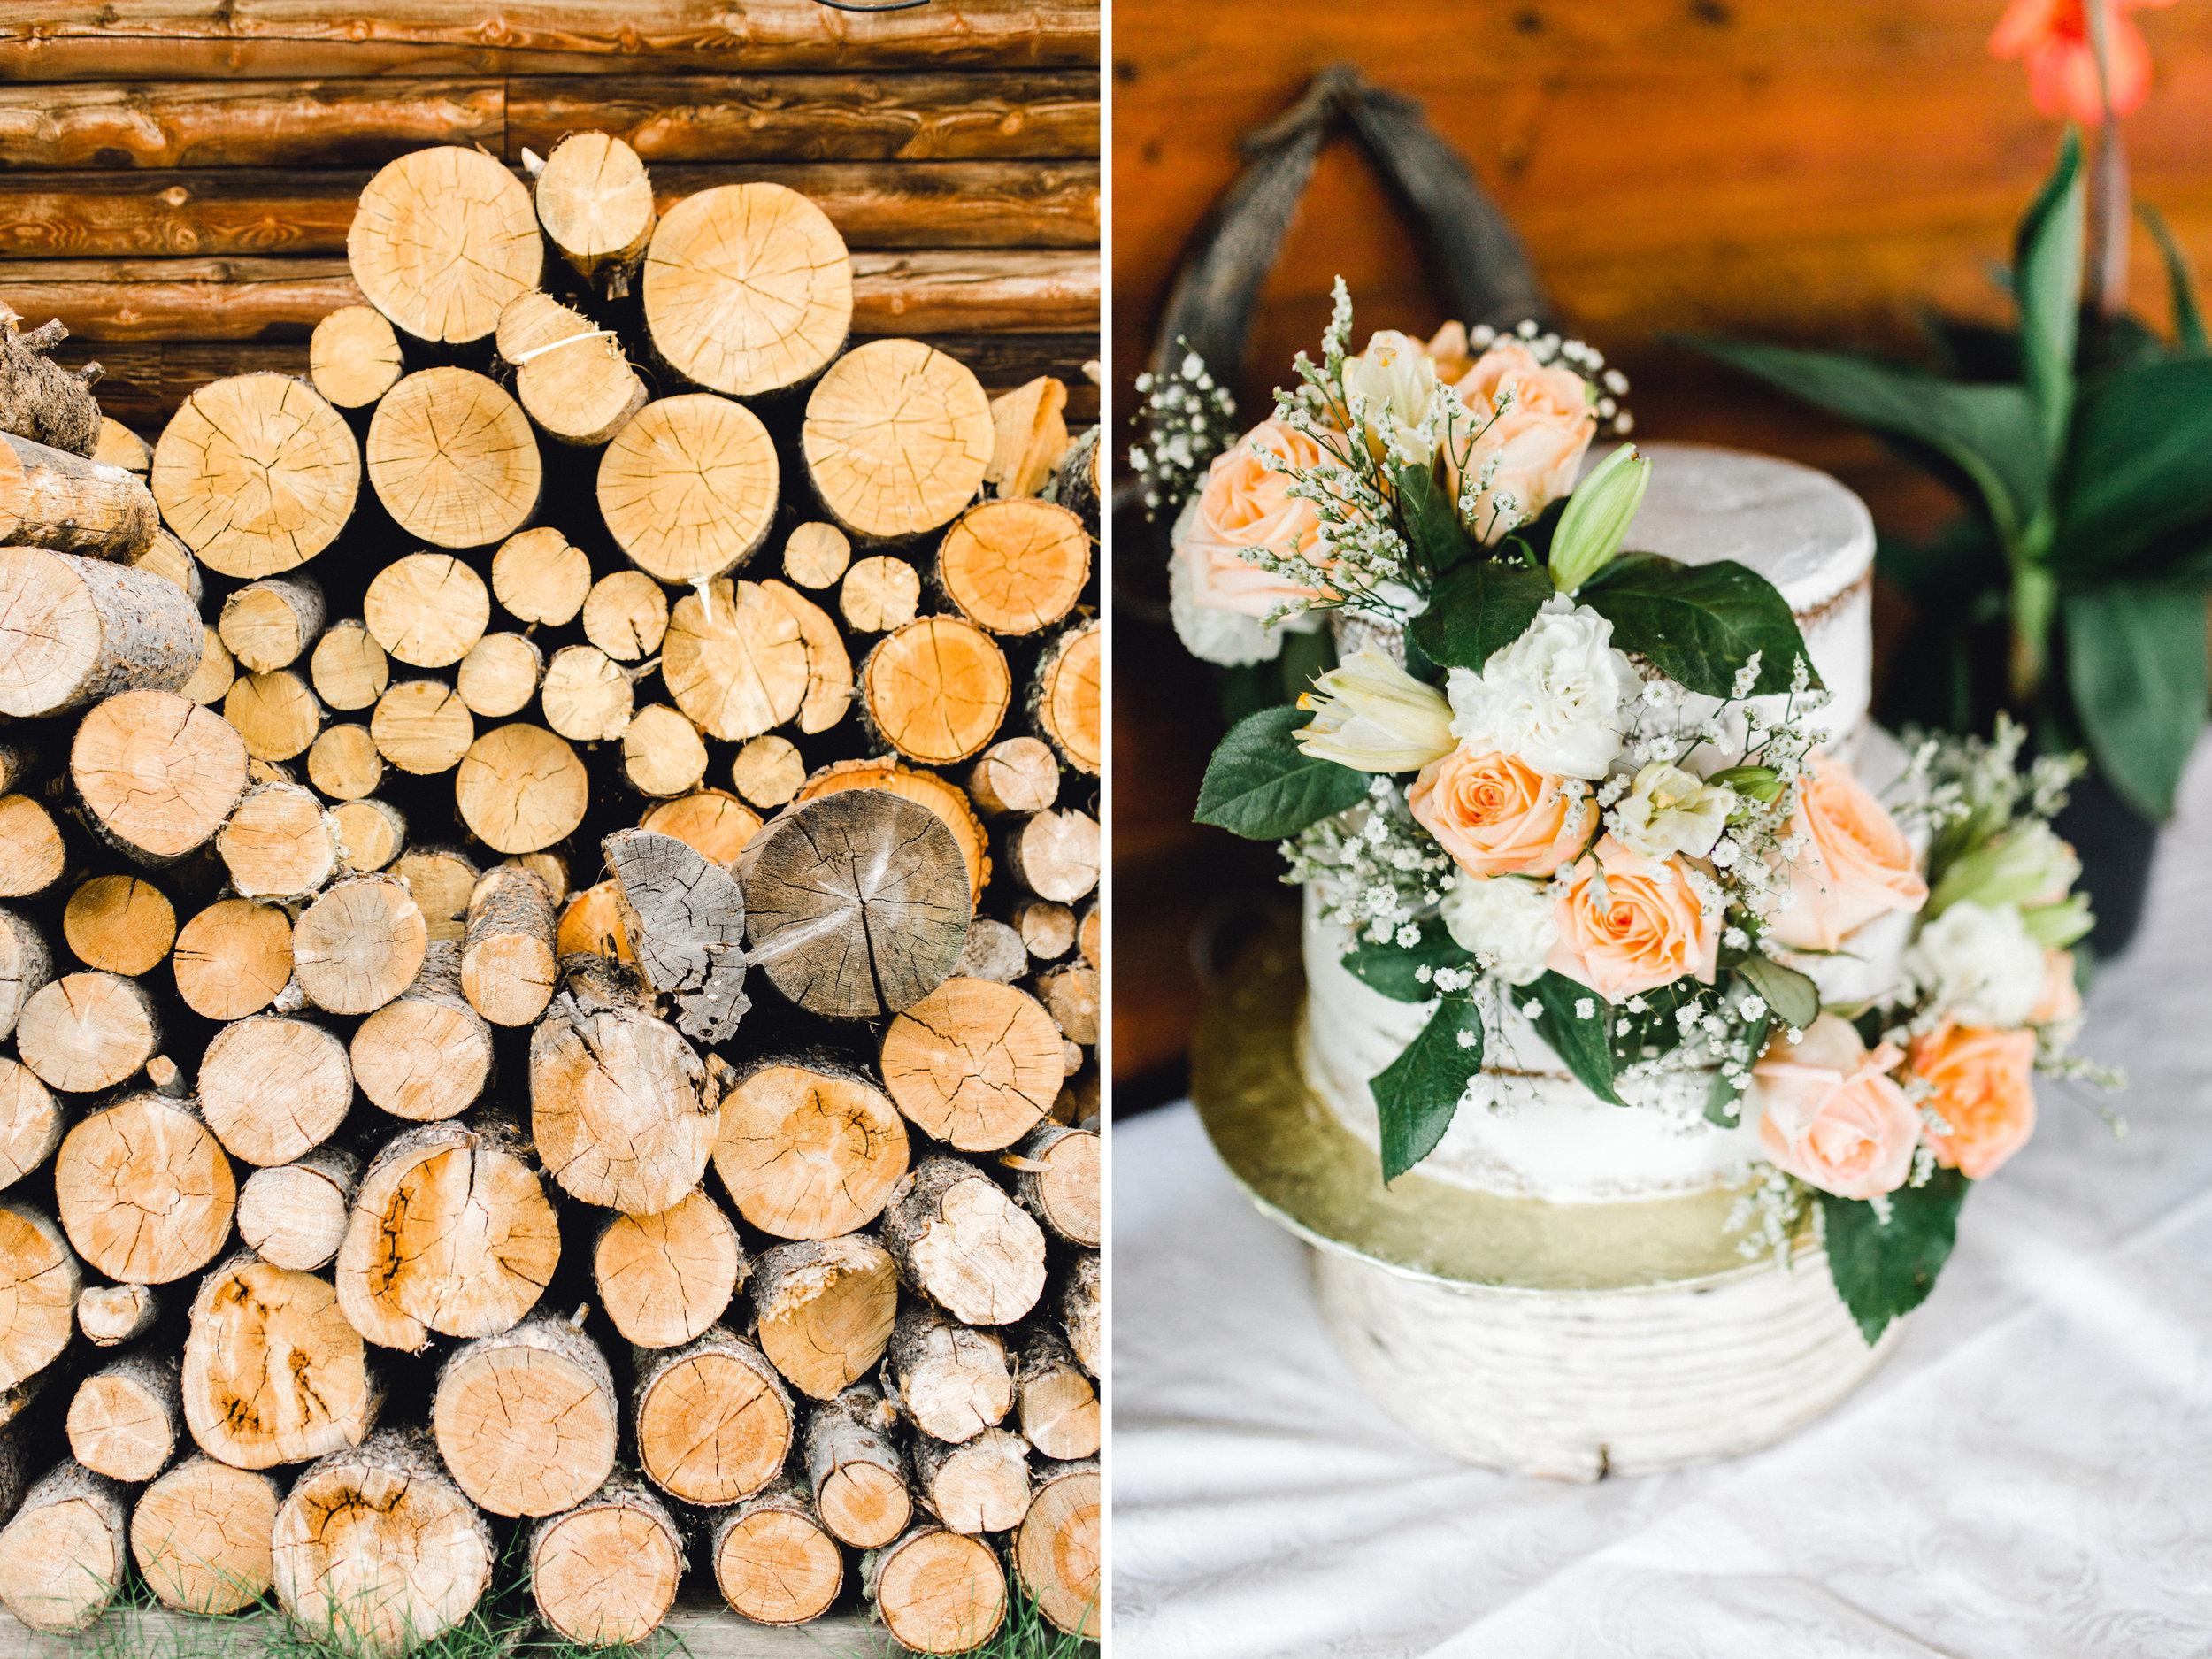 country-outdoor-rustic-wedding-tetons-idaho-anna-christine-photo-8.jpg